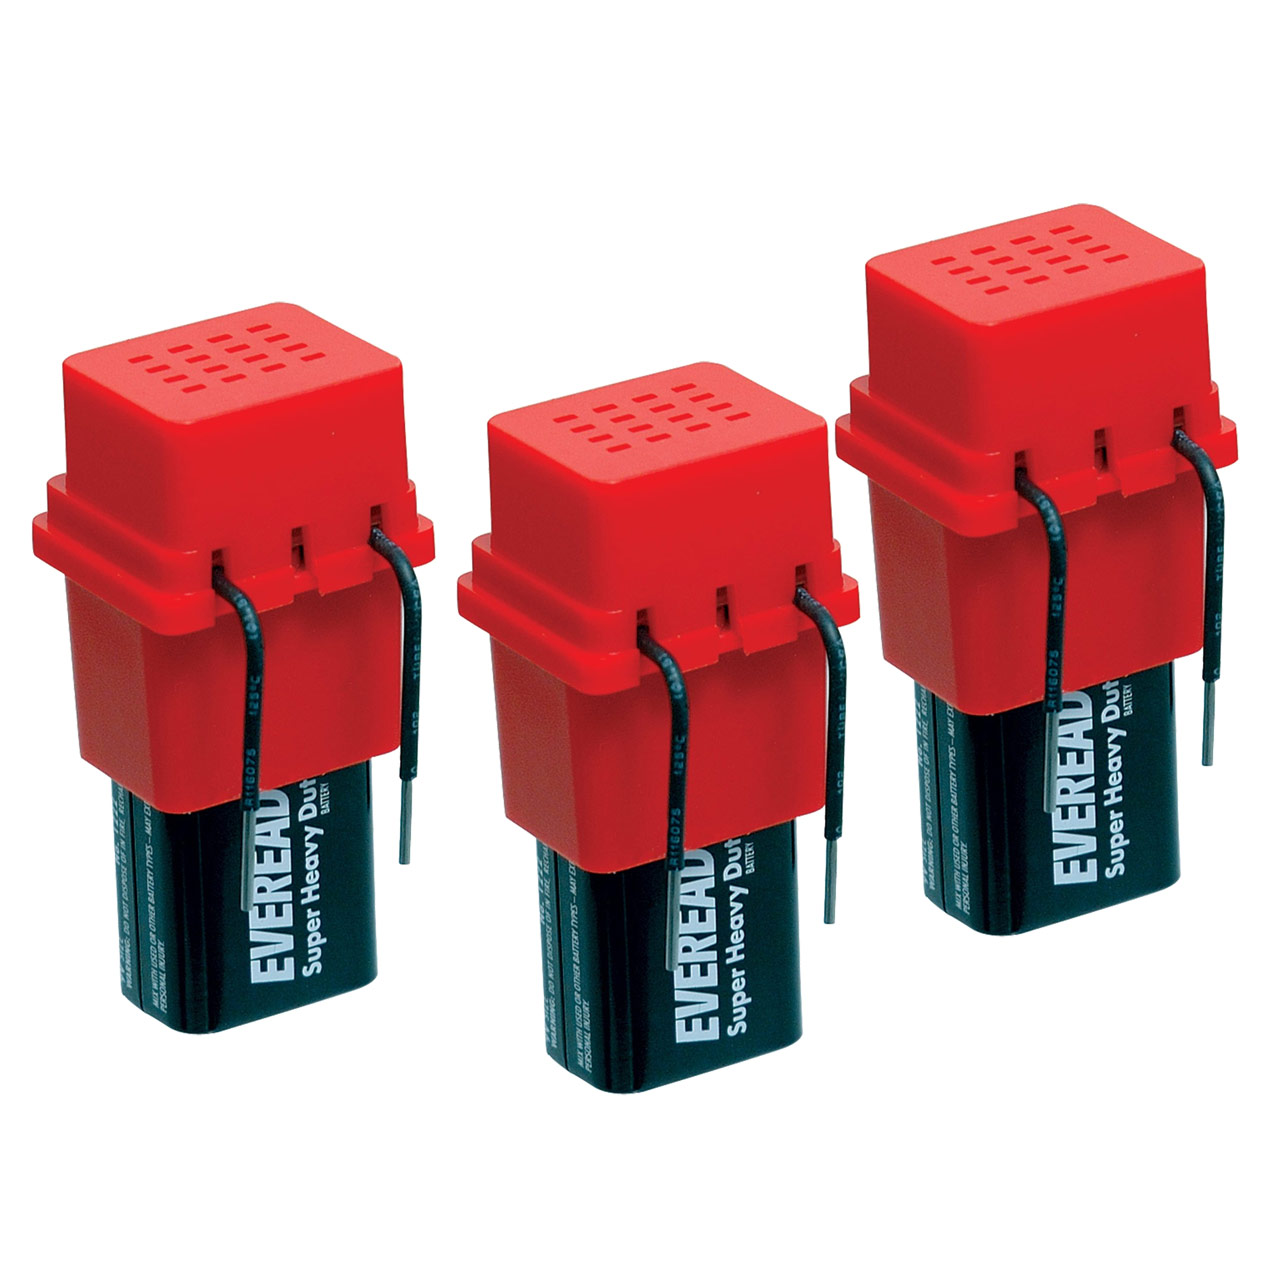 Vibrating Liquid Level Indicator - 3 Pack